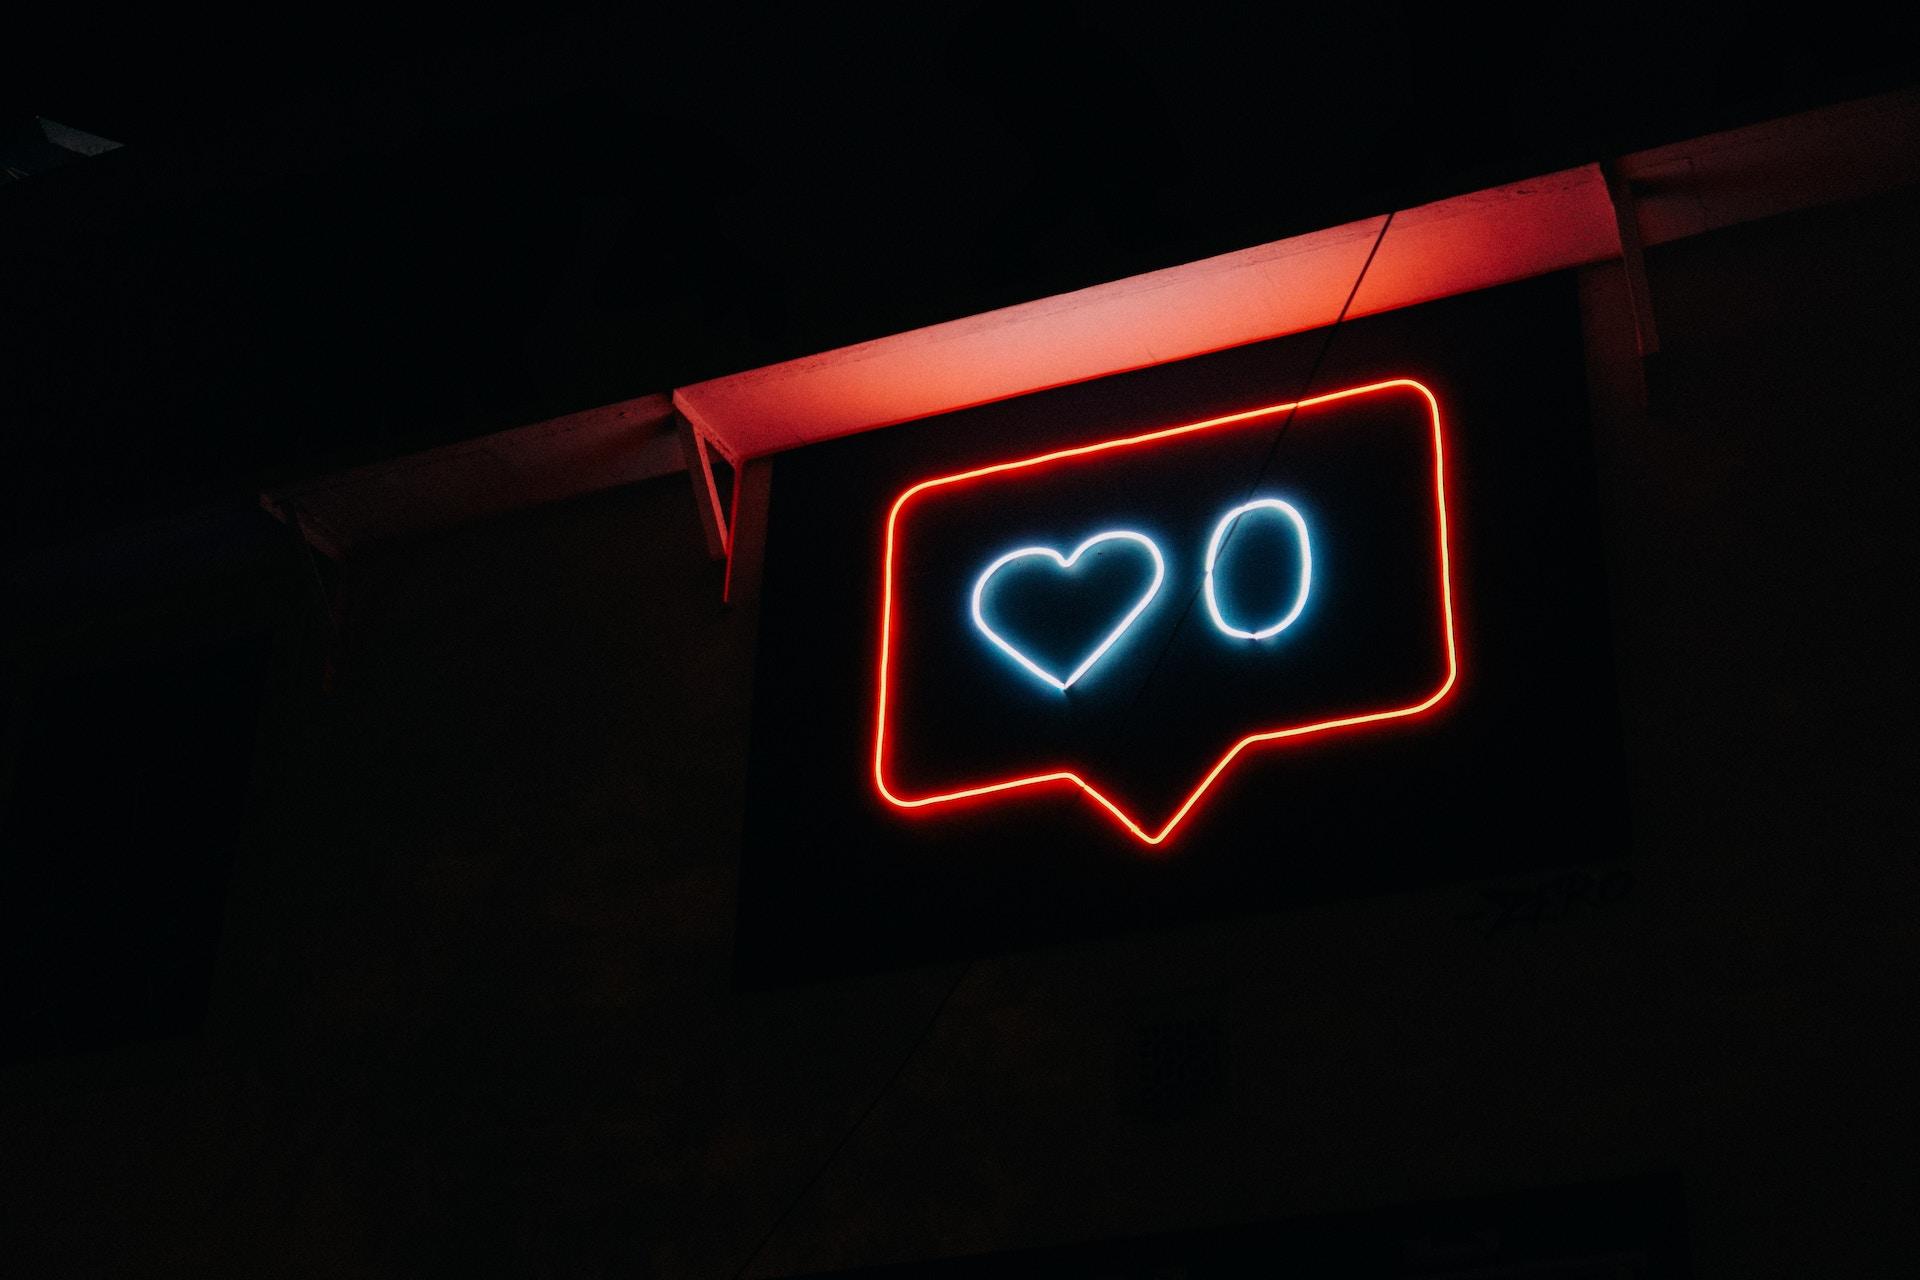 neon lights sign showing zero likes